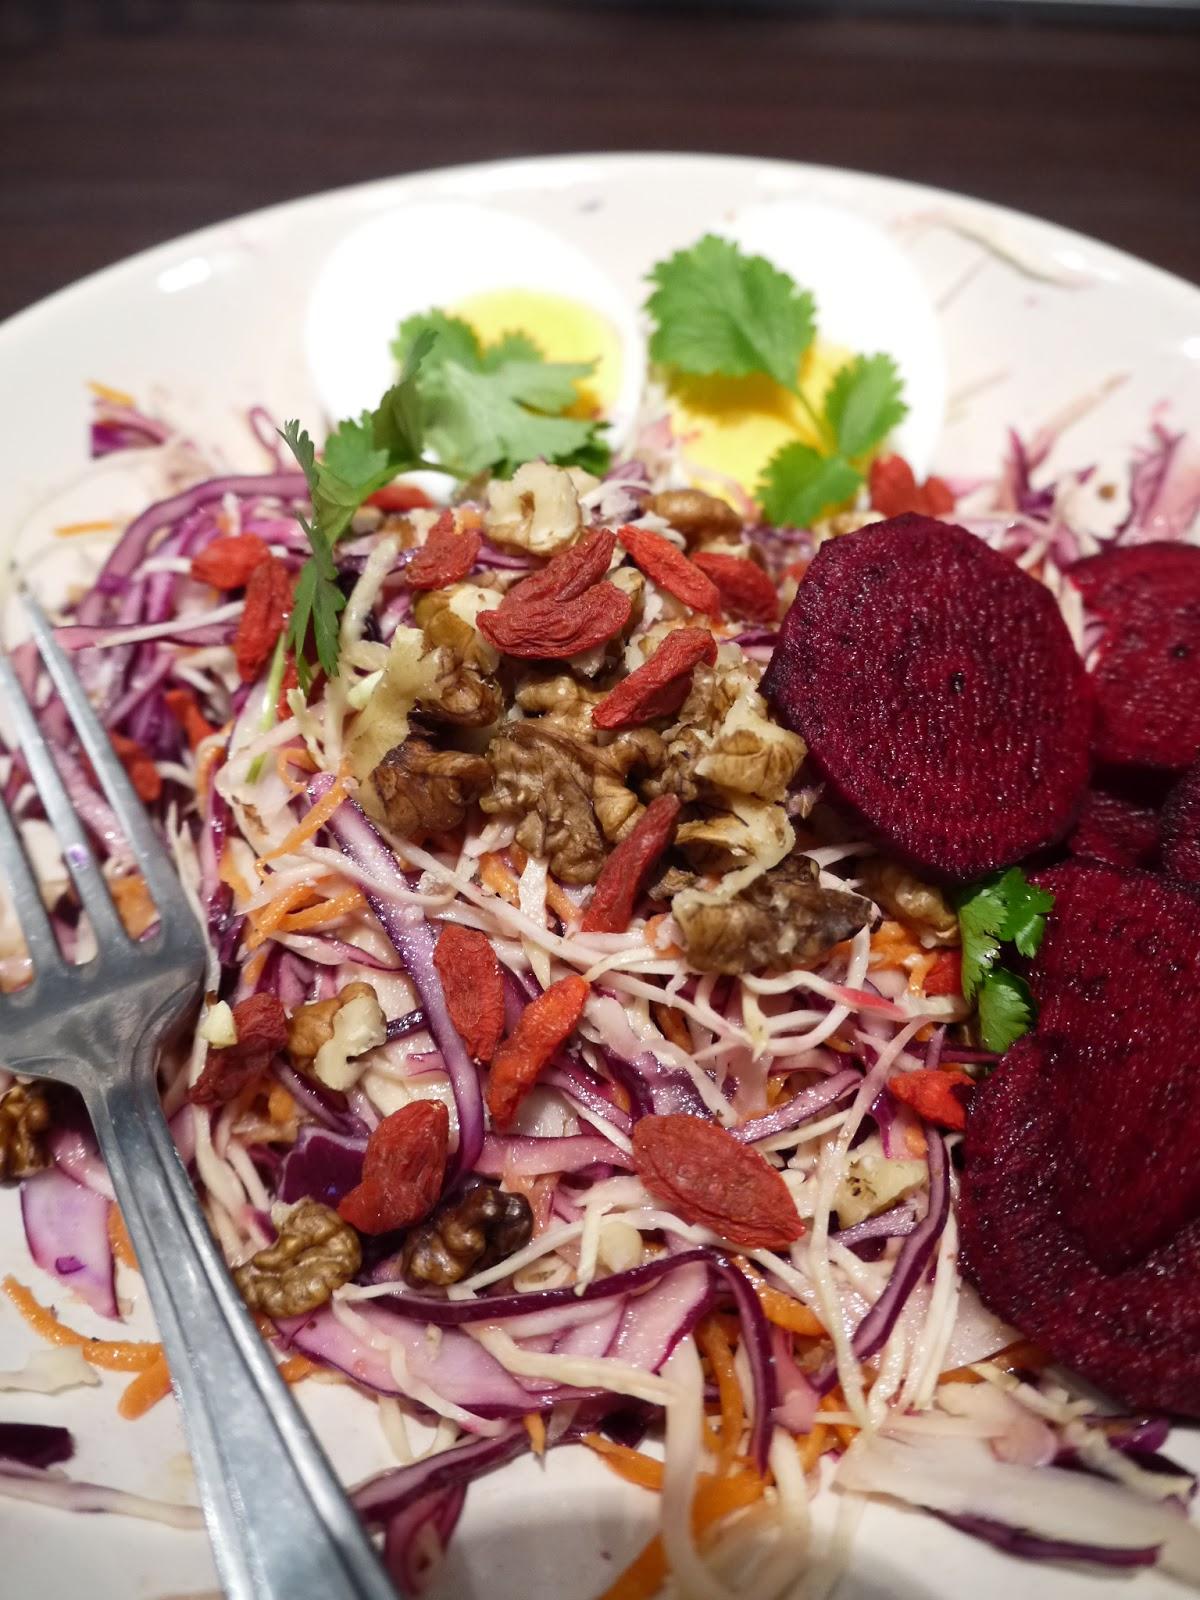 Appetit Voyage goes coleslaw